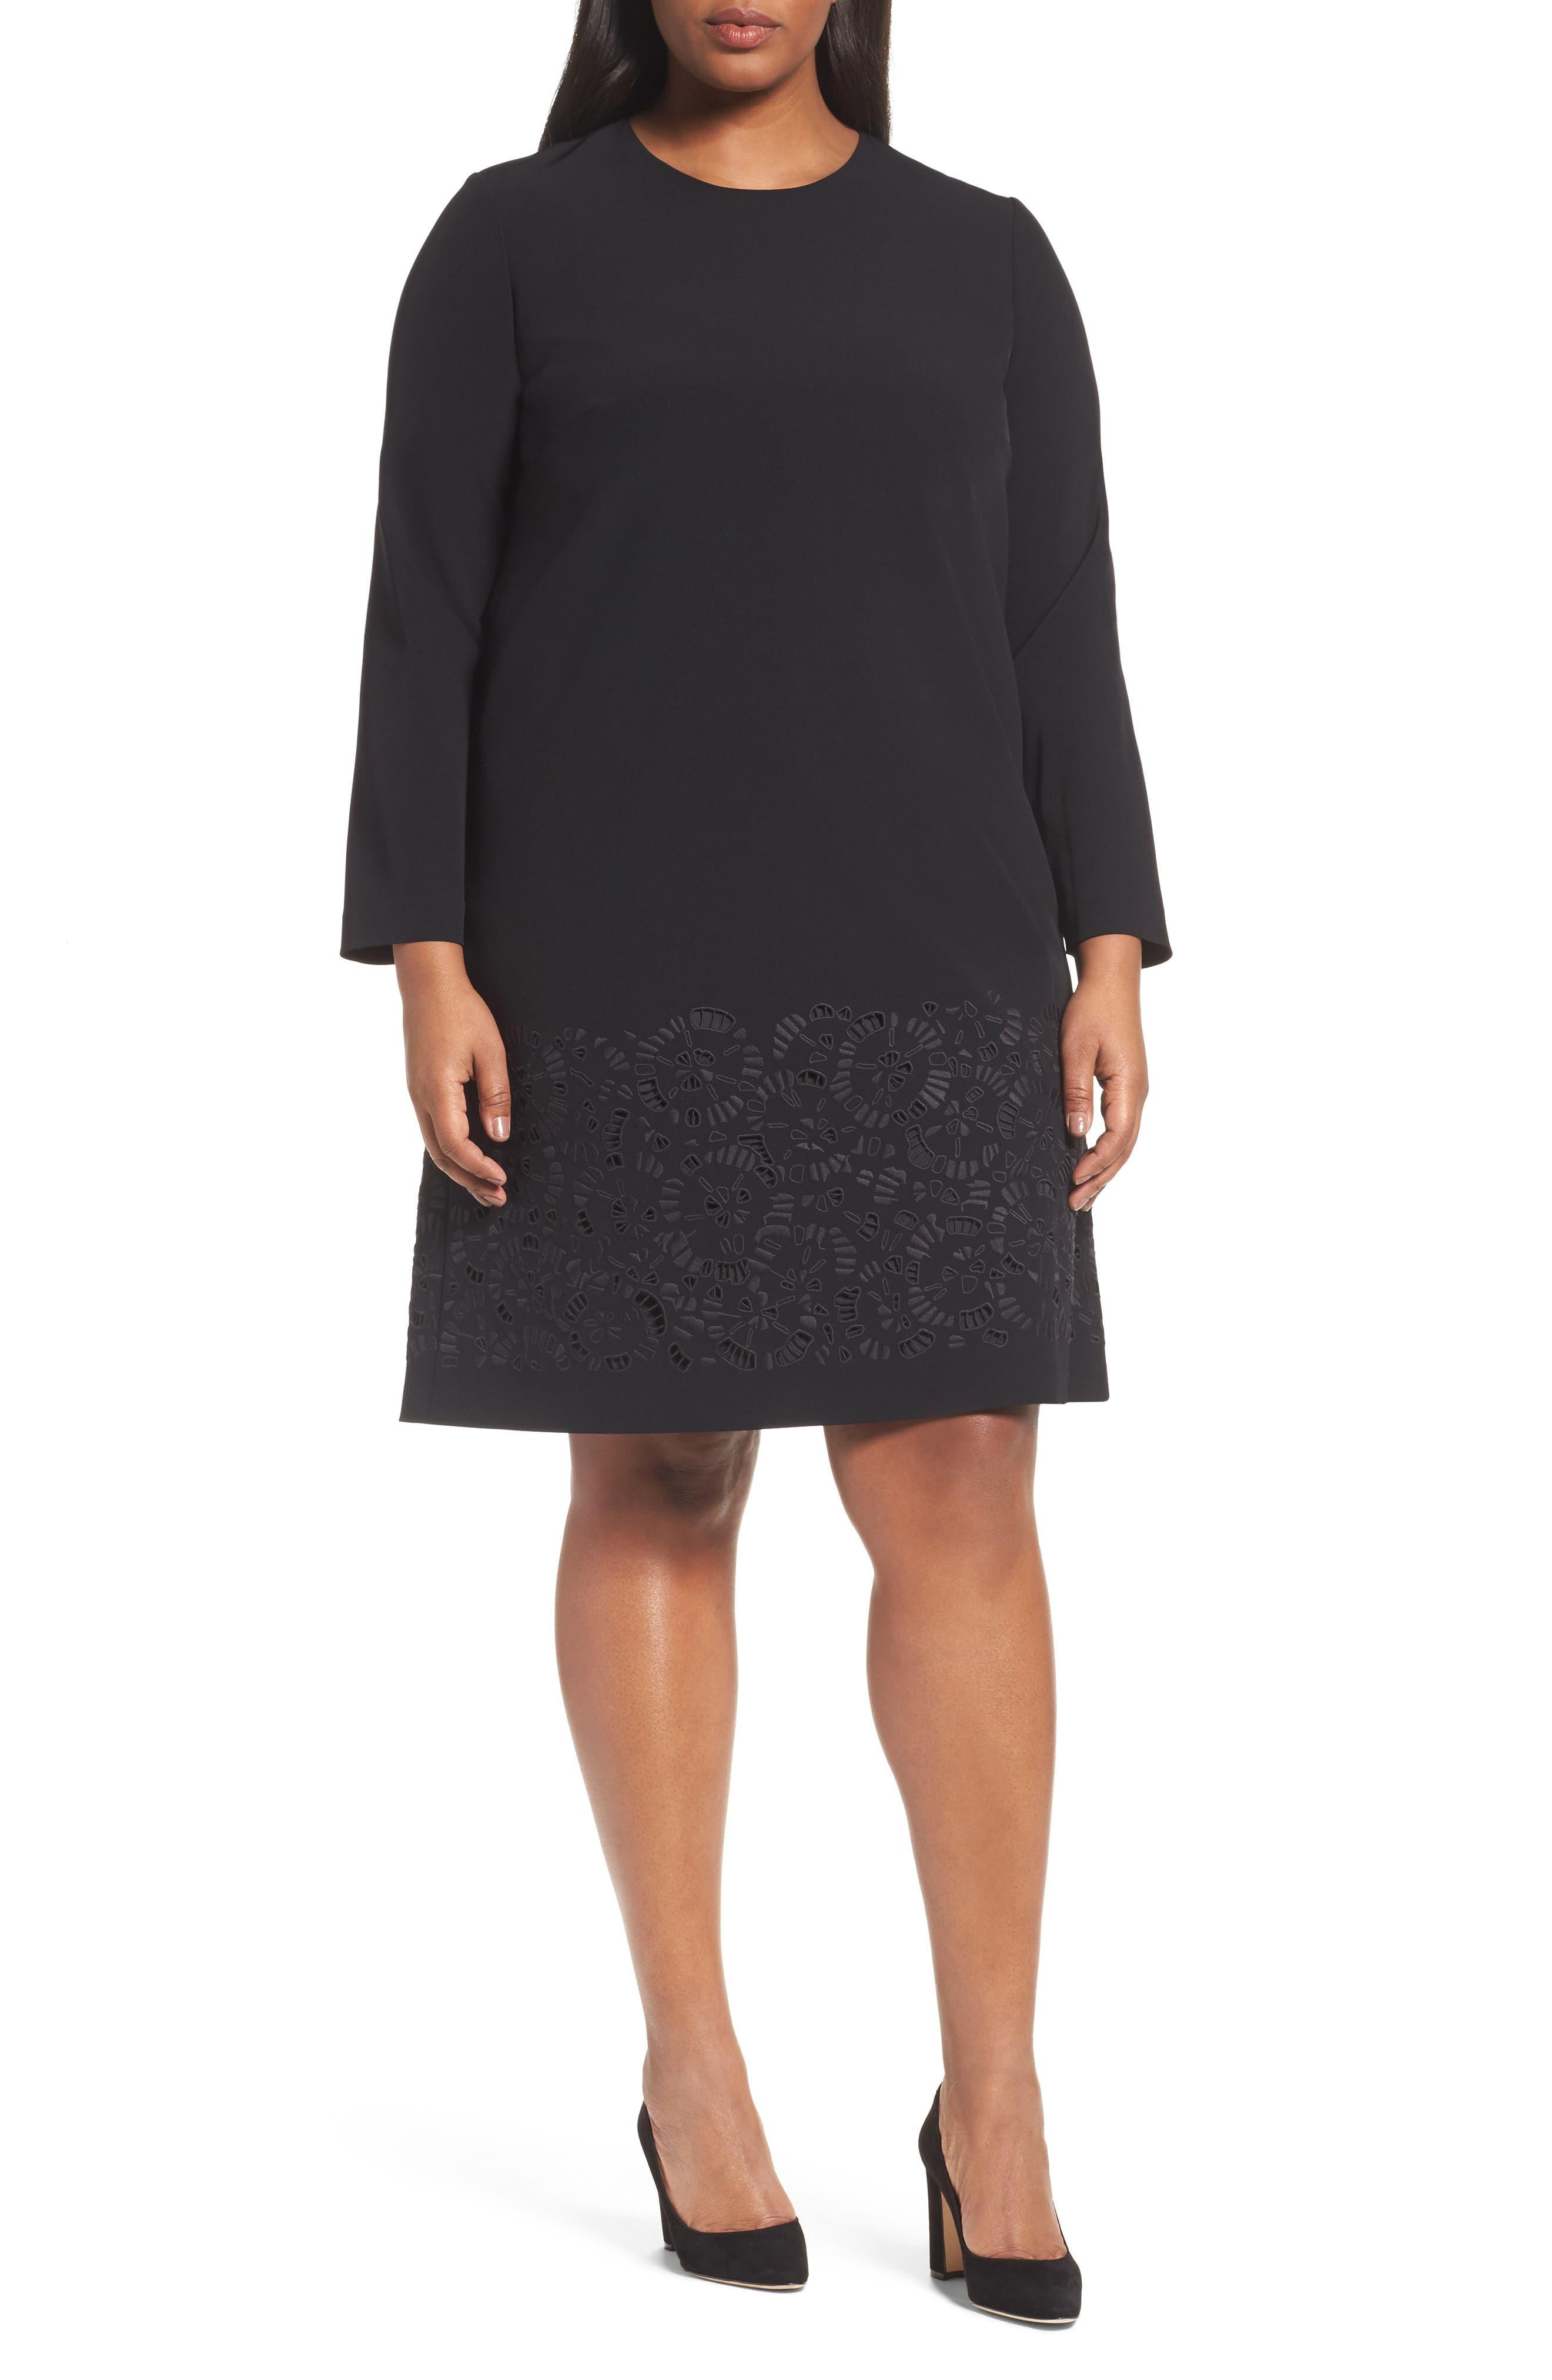 Corbin Laser Cut Dress,                             Main thumbnail 1, color,                             001